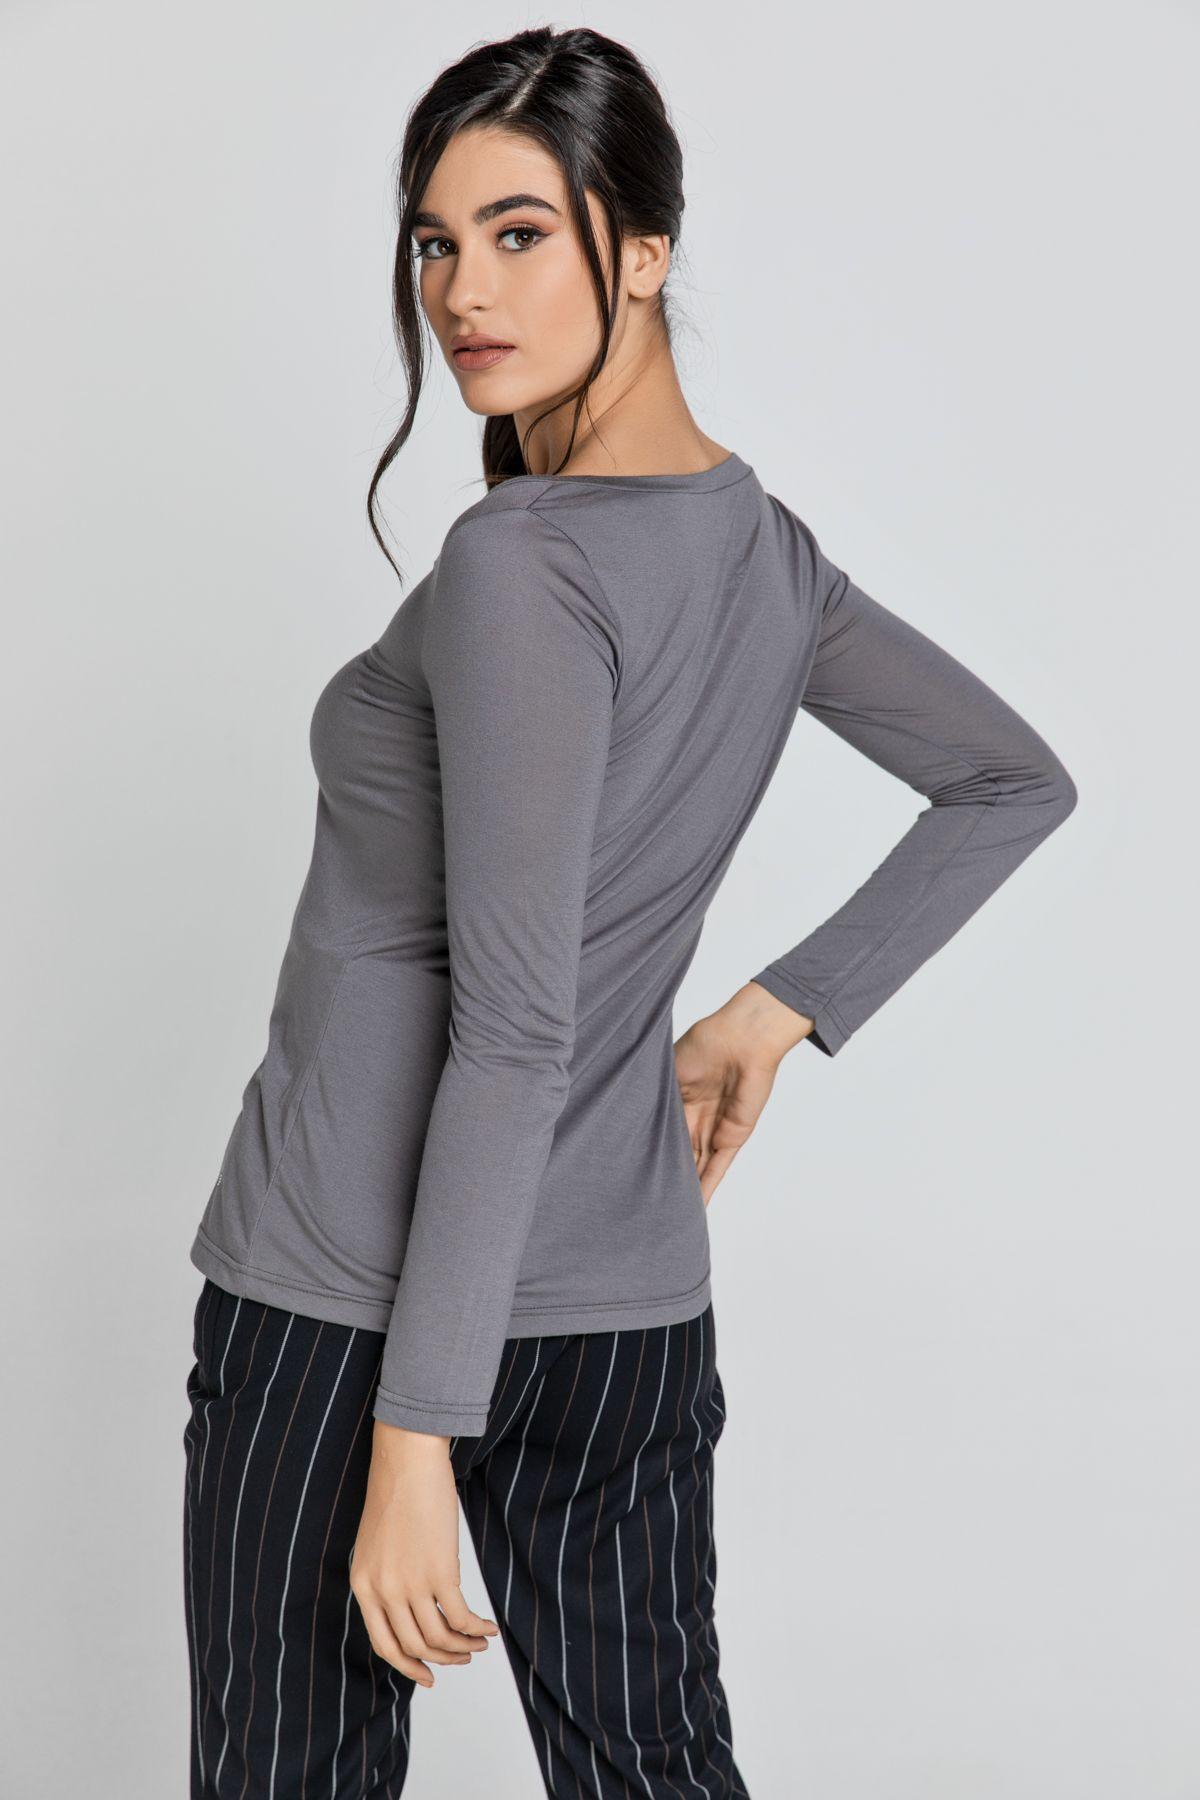 Dark Grey V Neck Top by SWL